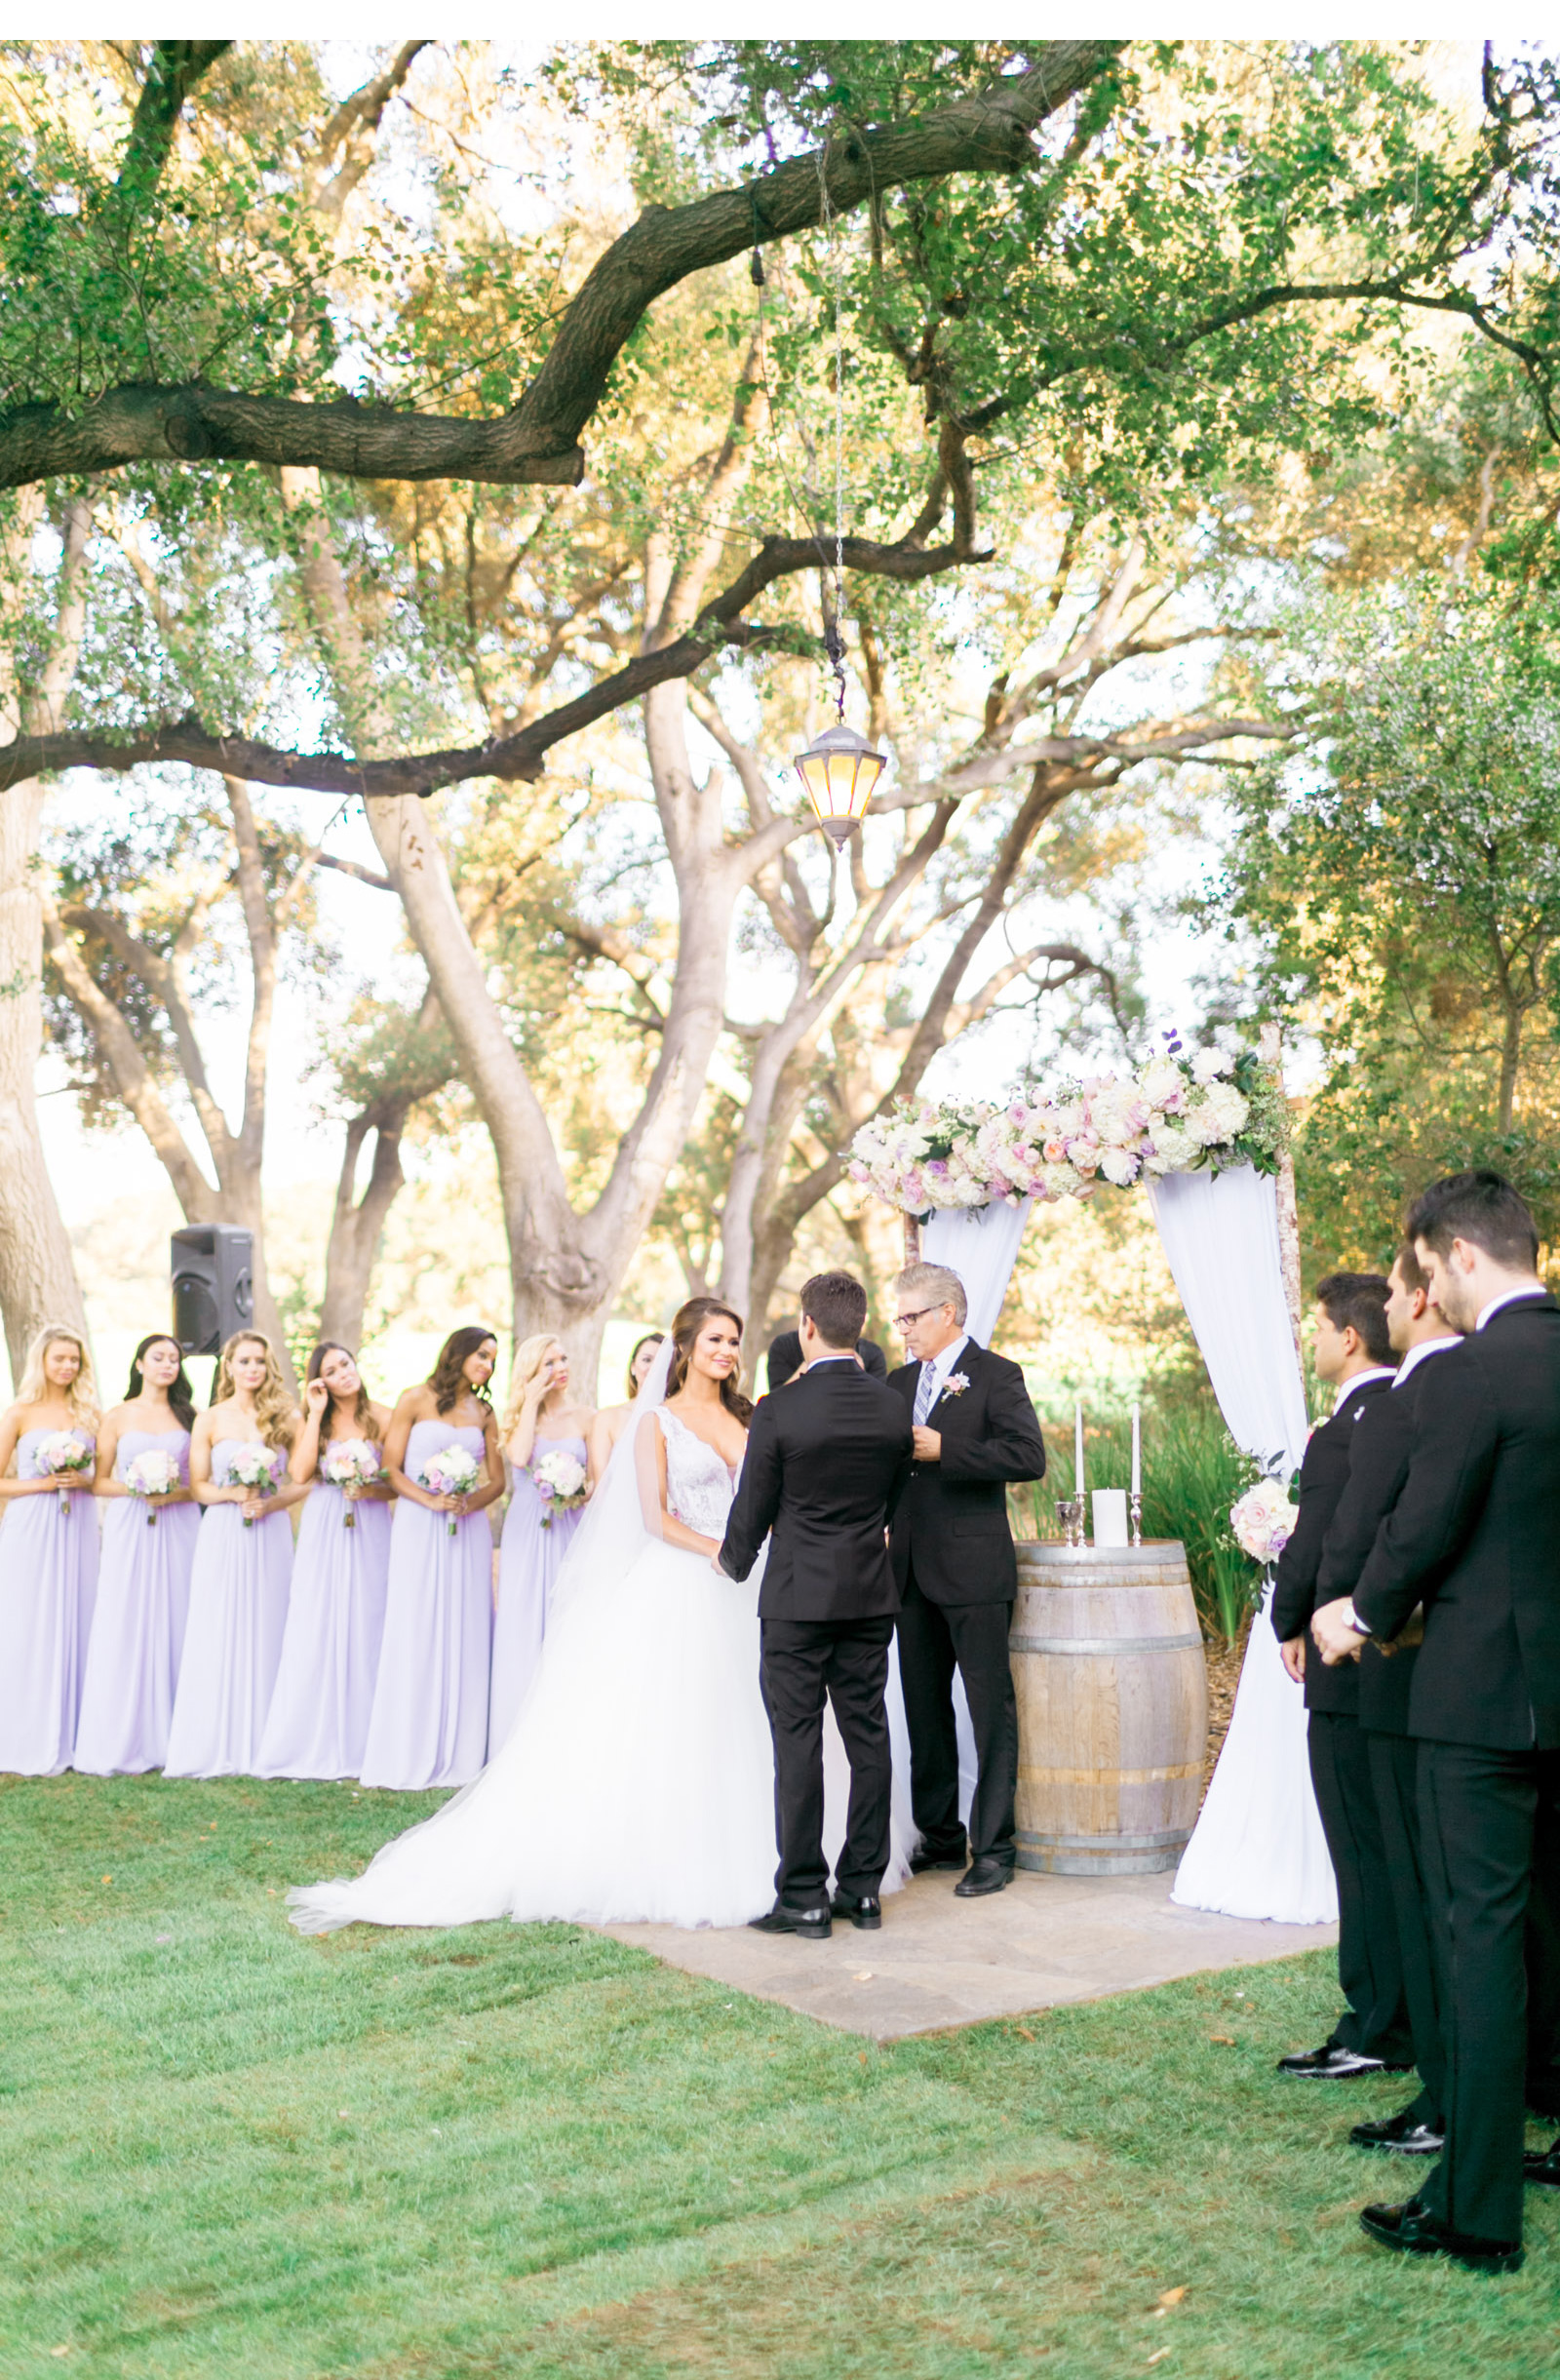 Temecula-Wedding-Miss-USA-Nia-Booko-Natalie-Schutt-Photography_04.jpg